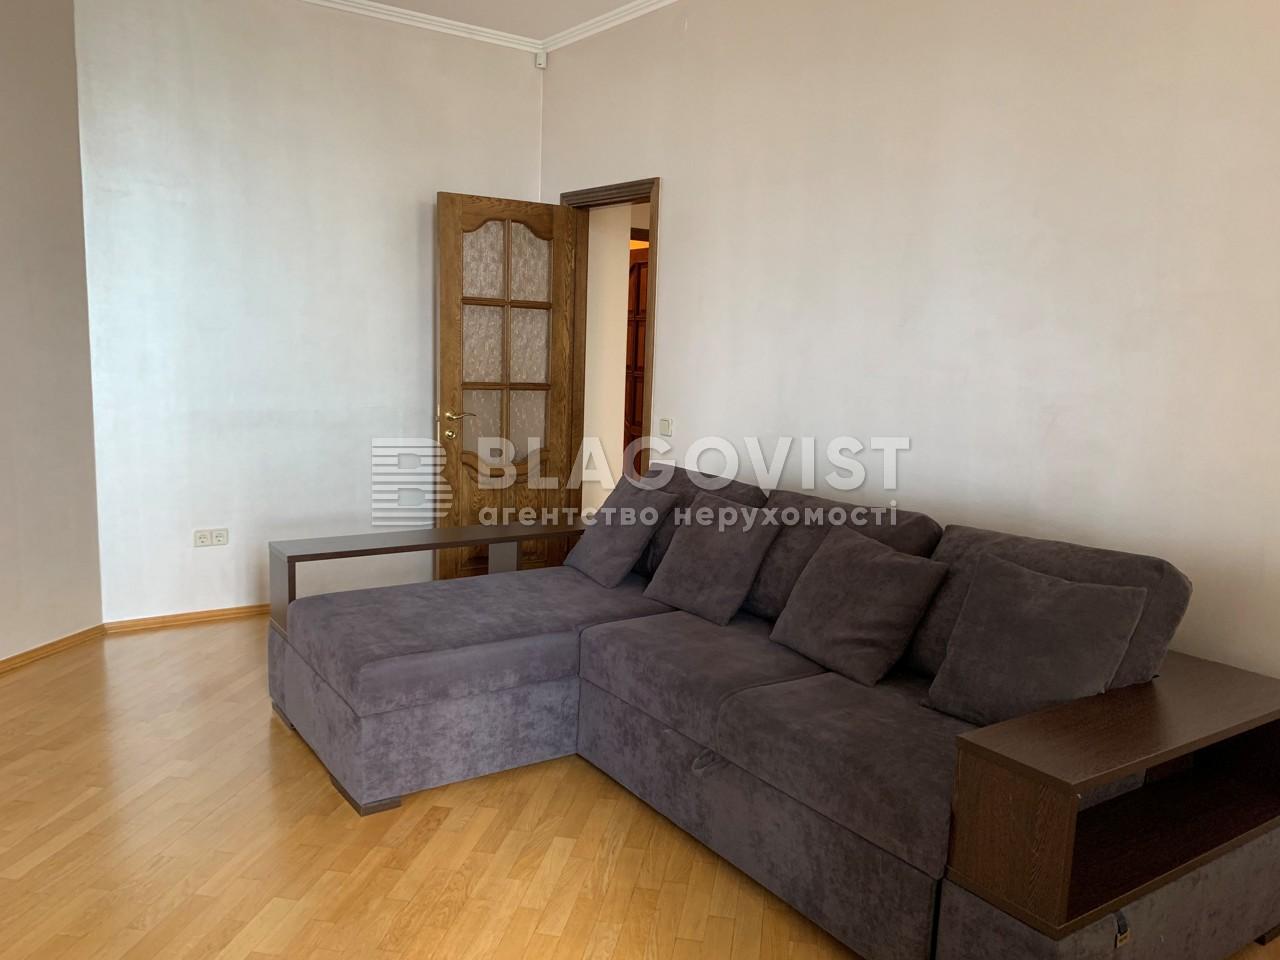 Квартира C-77006, Хмельницкого Богдана, 41, Киев - Фото 10